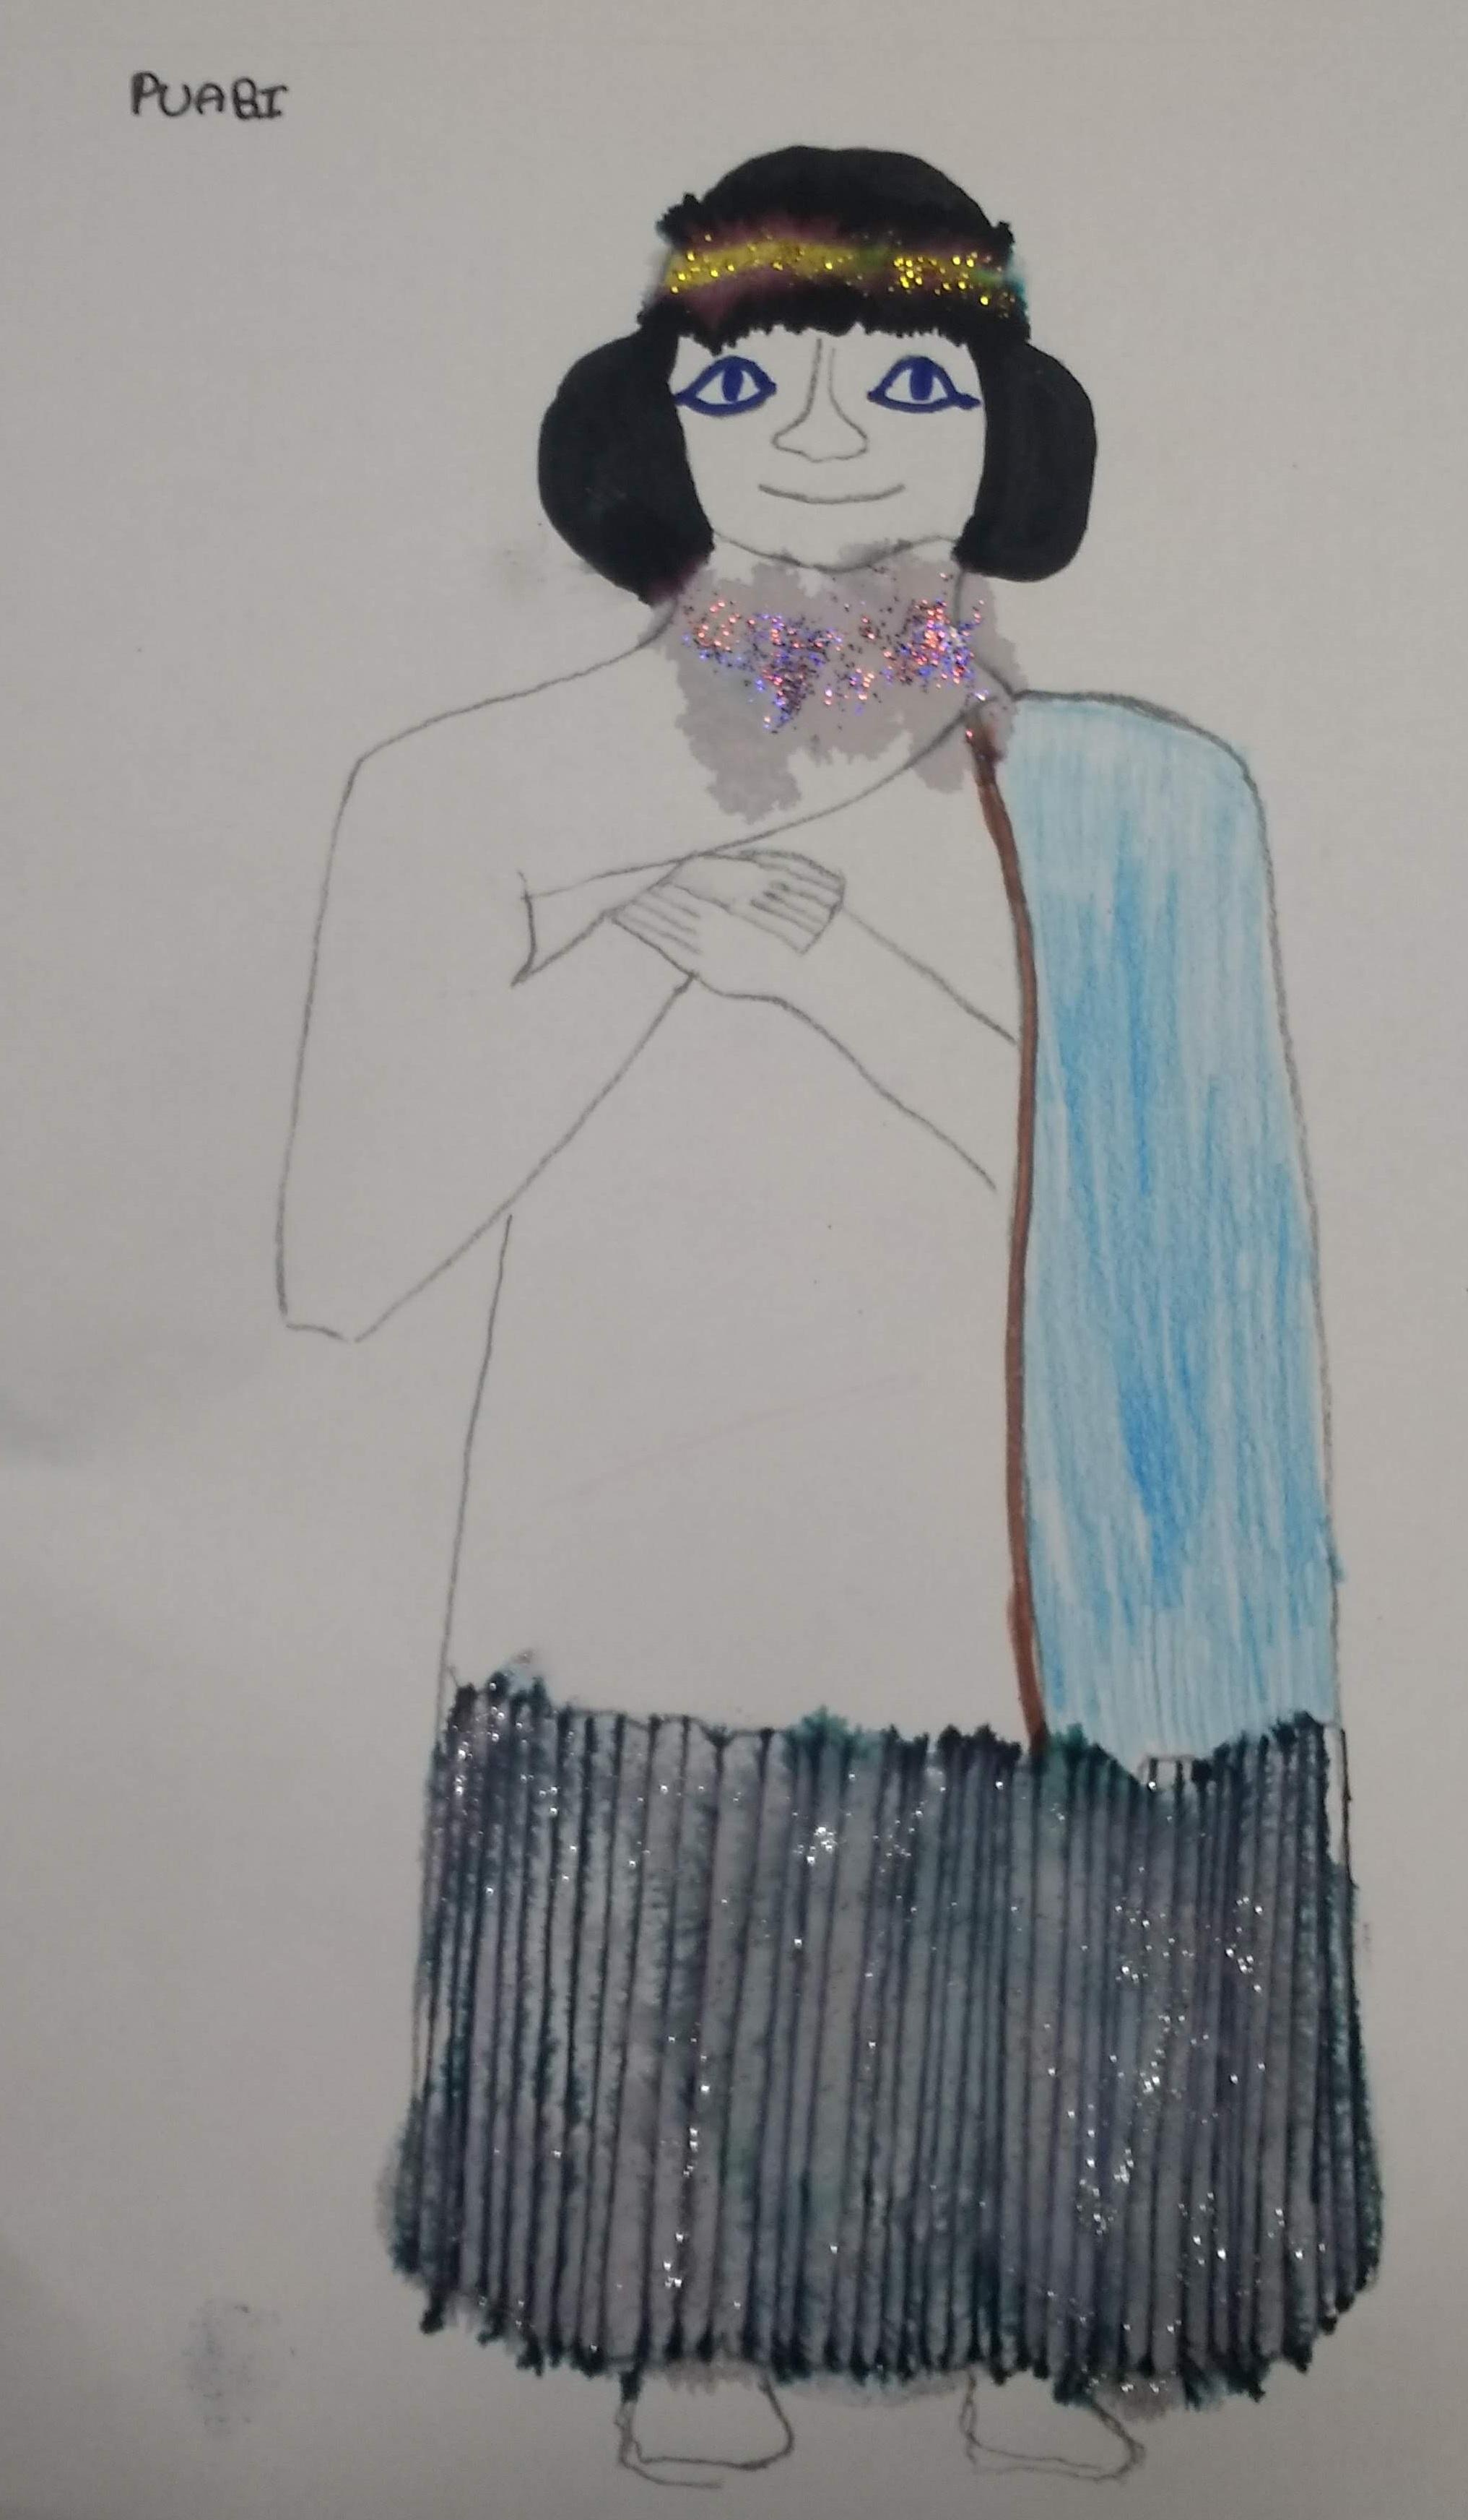 Sienna - Puabi